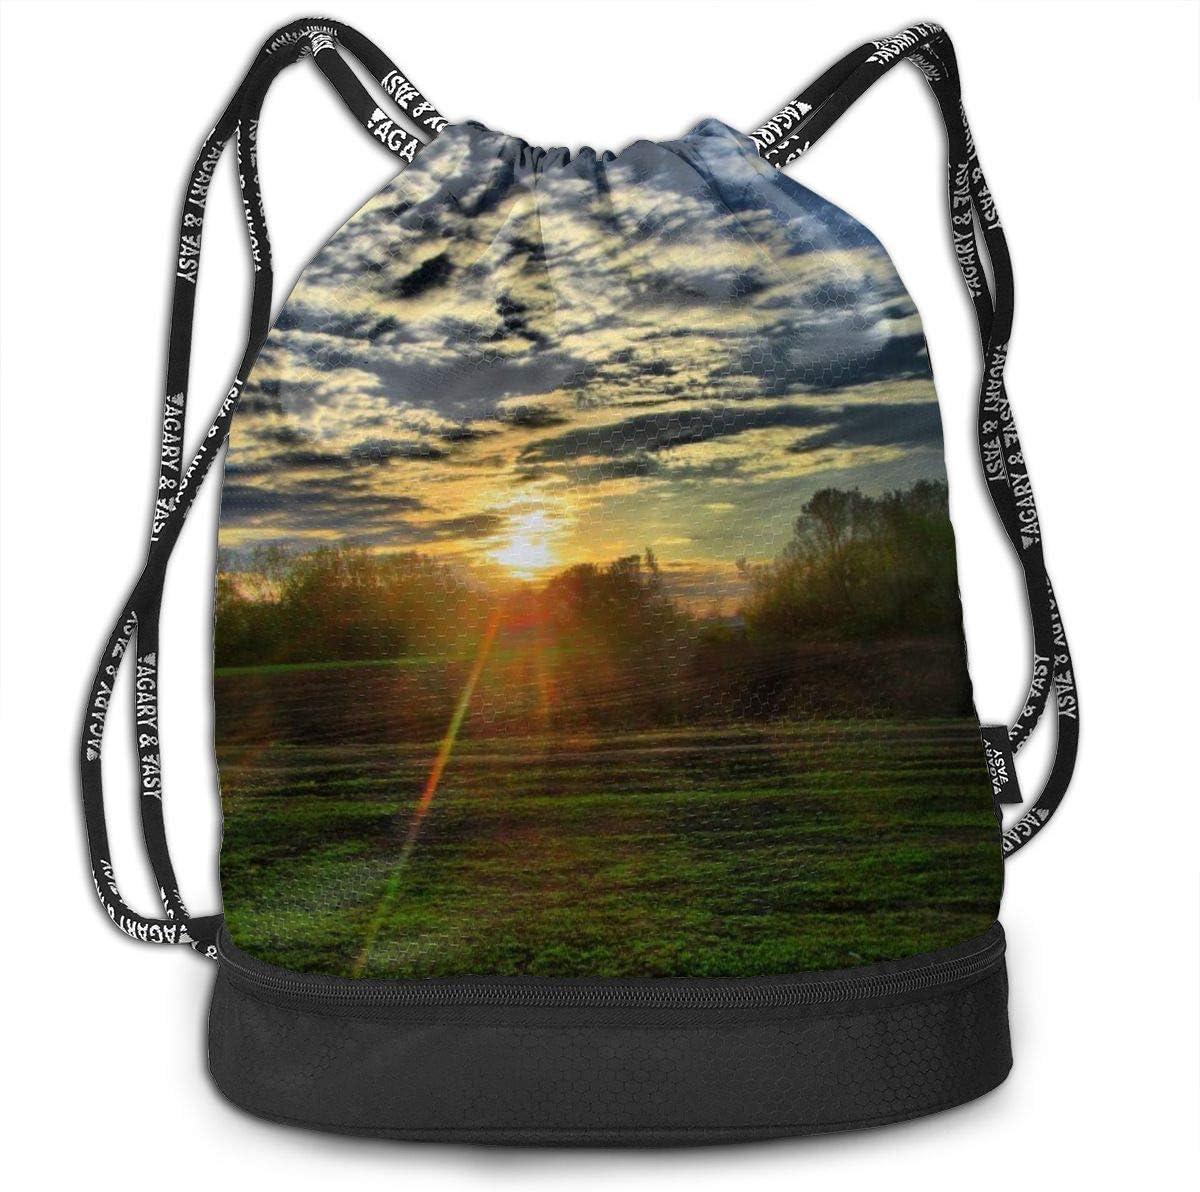 GymSack Drawstring Bag Sackpack Brain In Cage Sport Cinch Pack Simple Bundle Pocke Backpack For Men Women